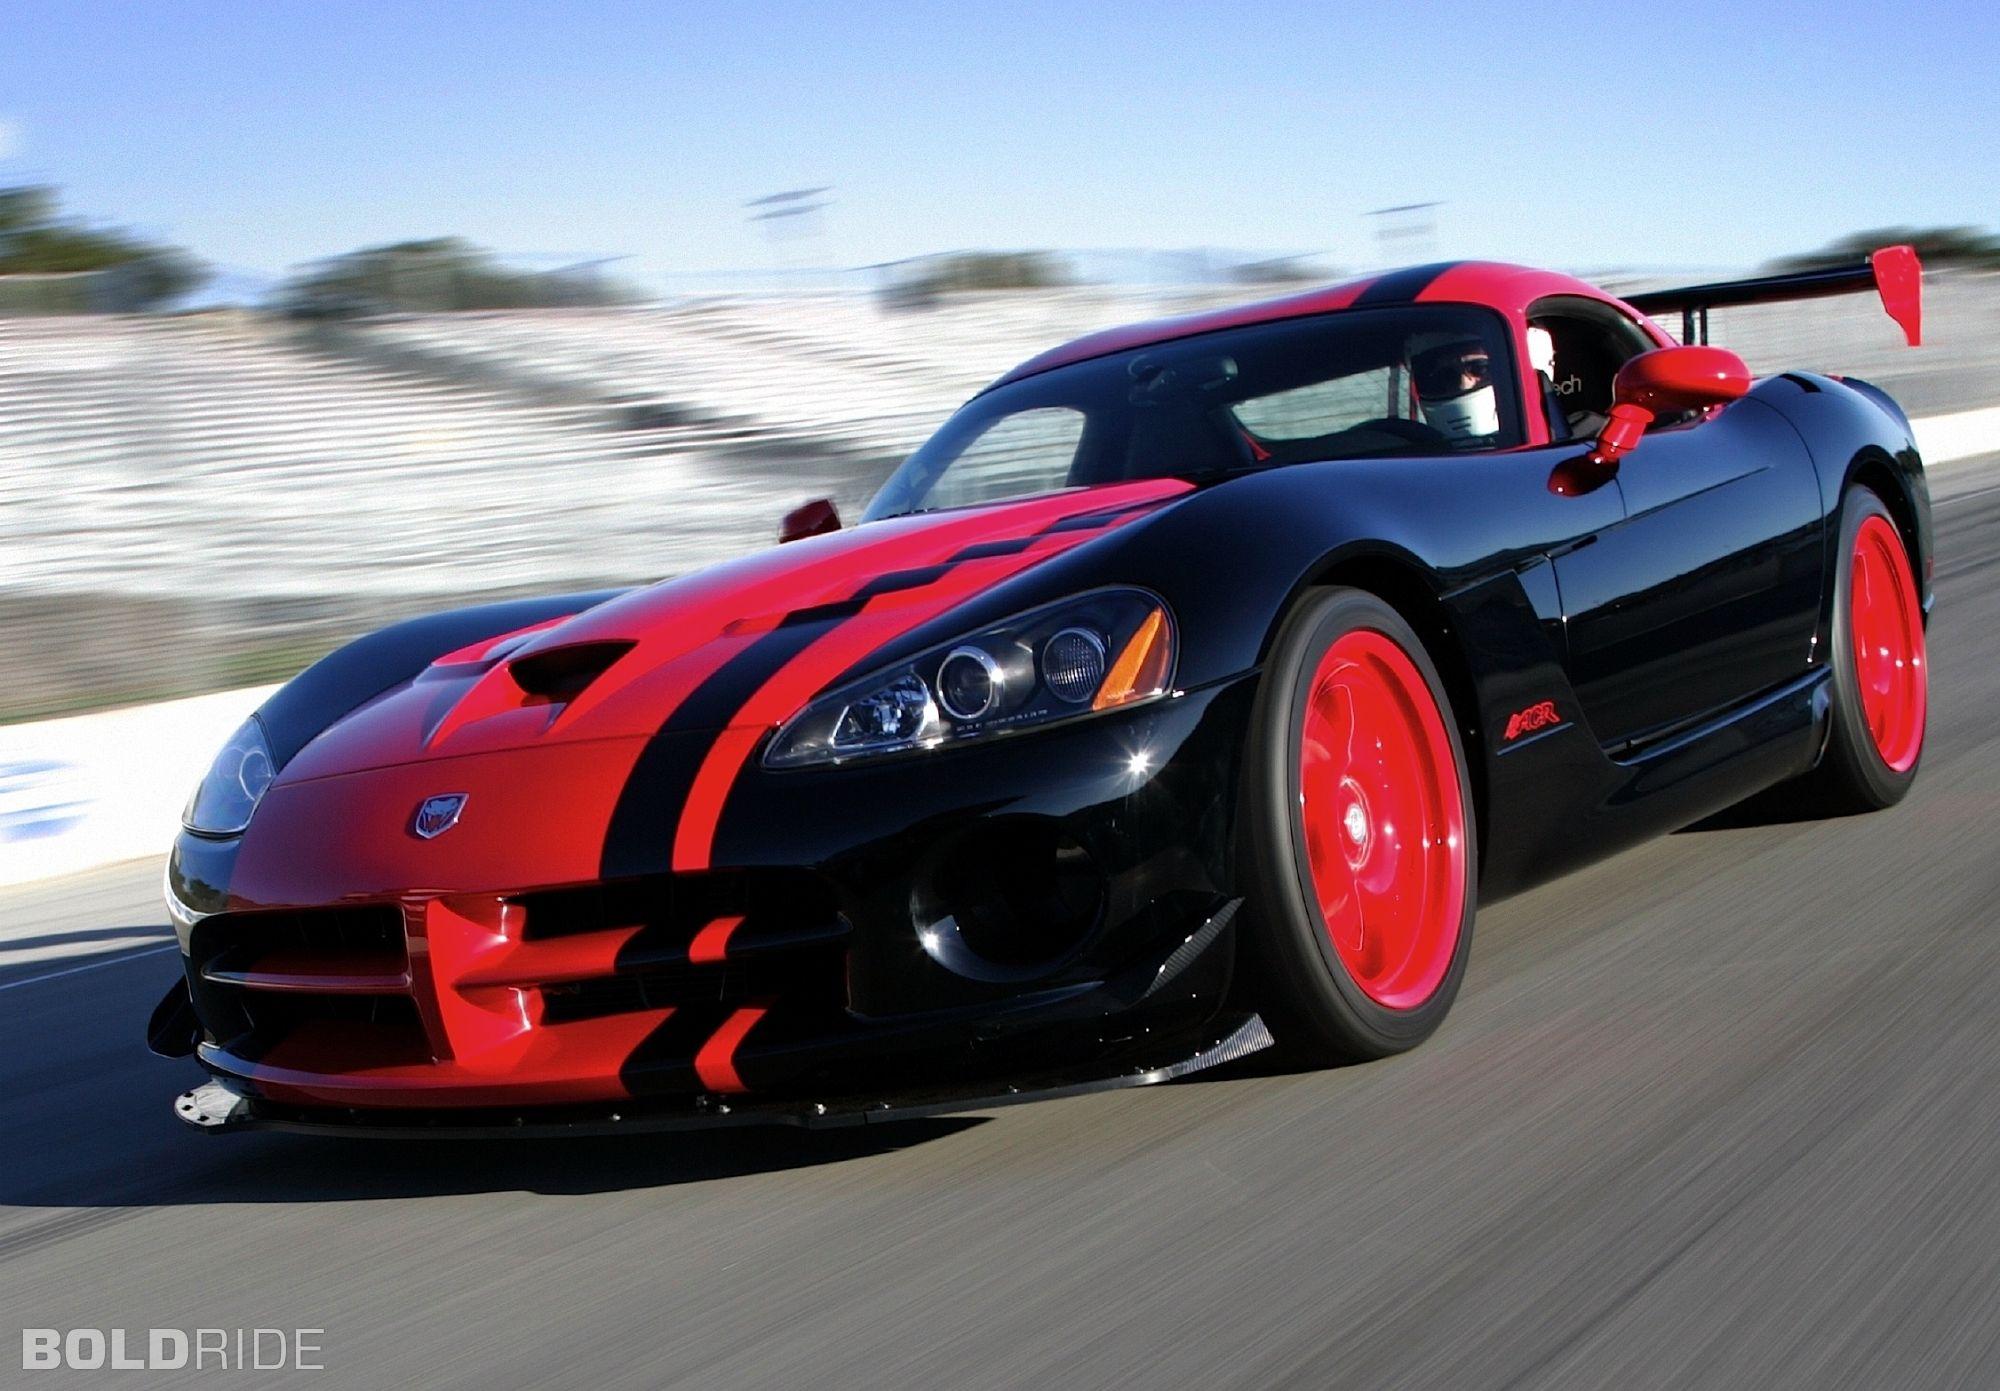 Best 25 2010 dodge viper ideas only on pinterest viper car used dodge viper and dodge viper srt 10